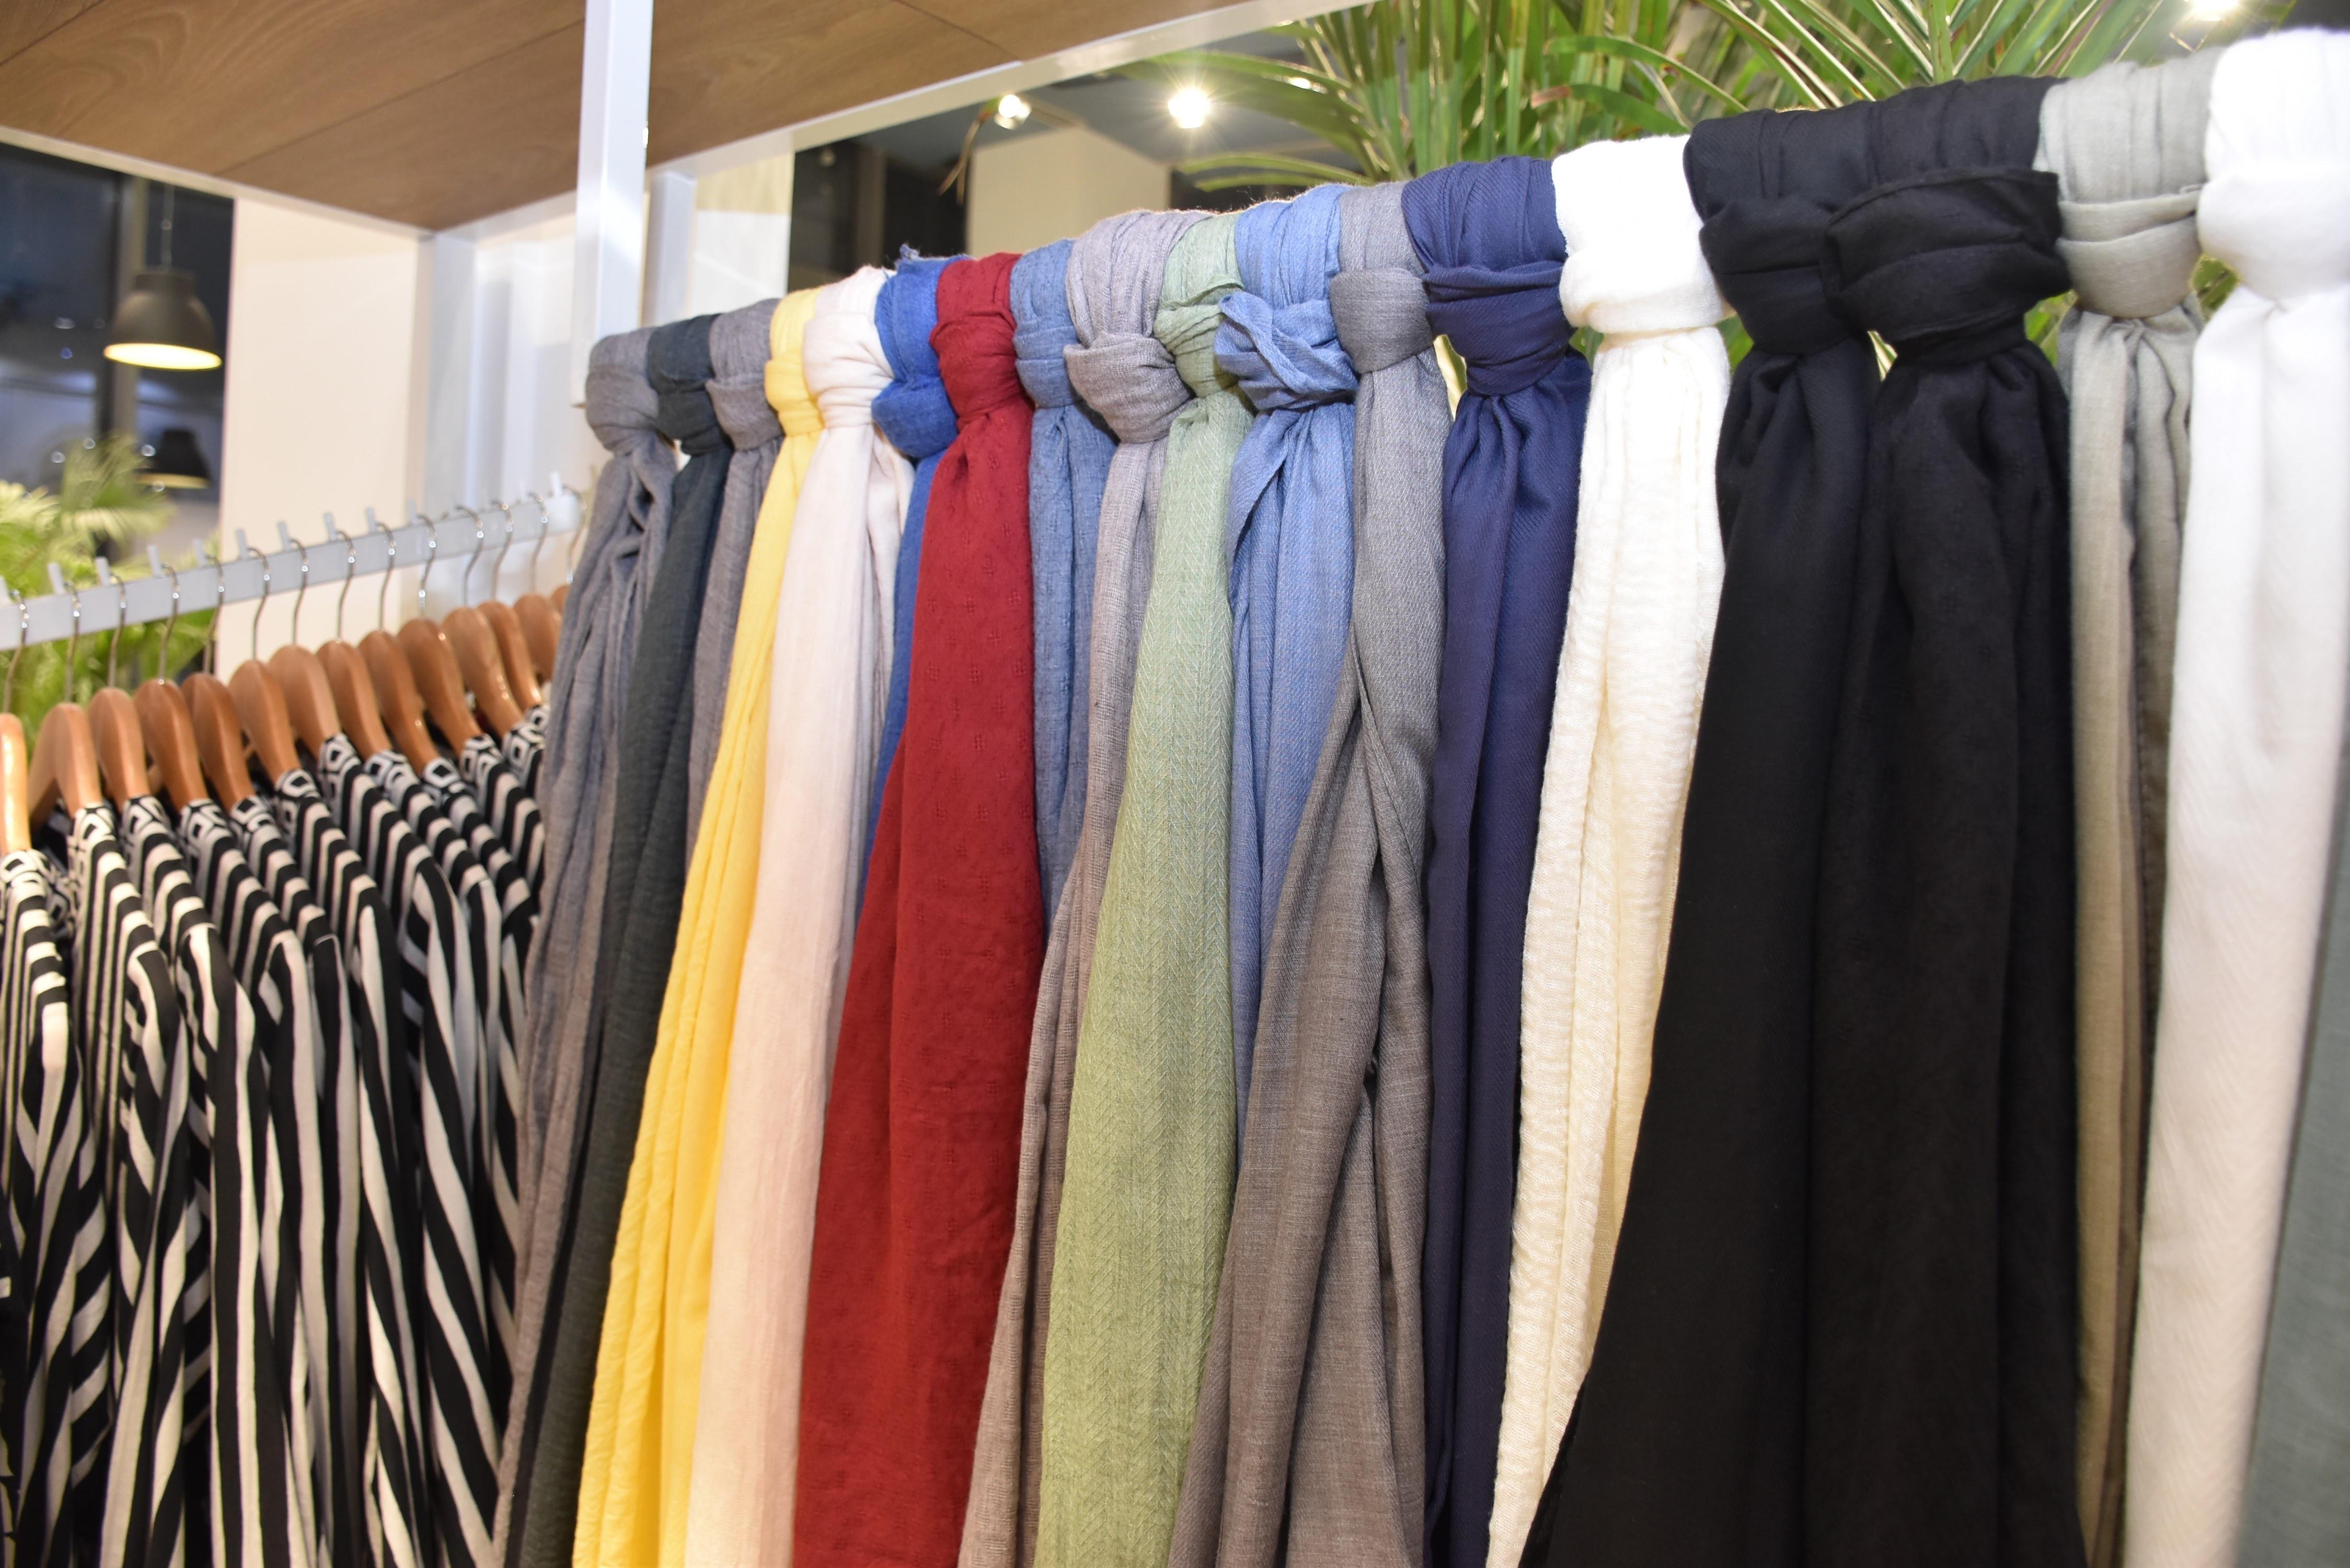 Free Images : curtain, clothing, room, interior design, boutique ...